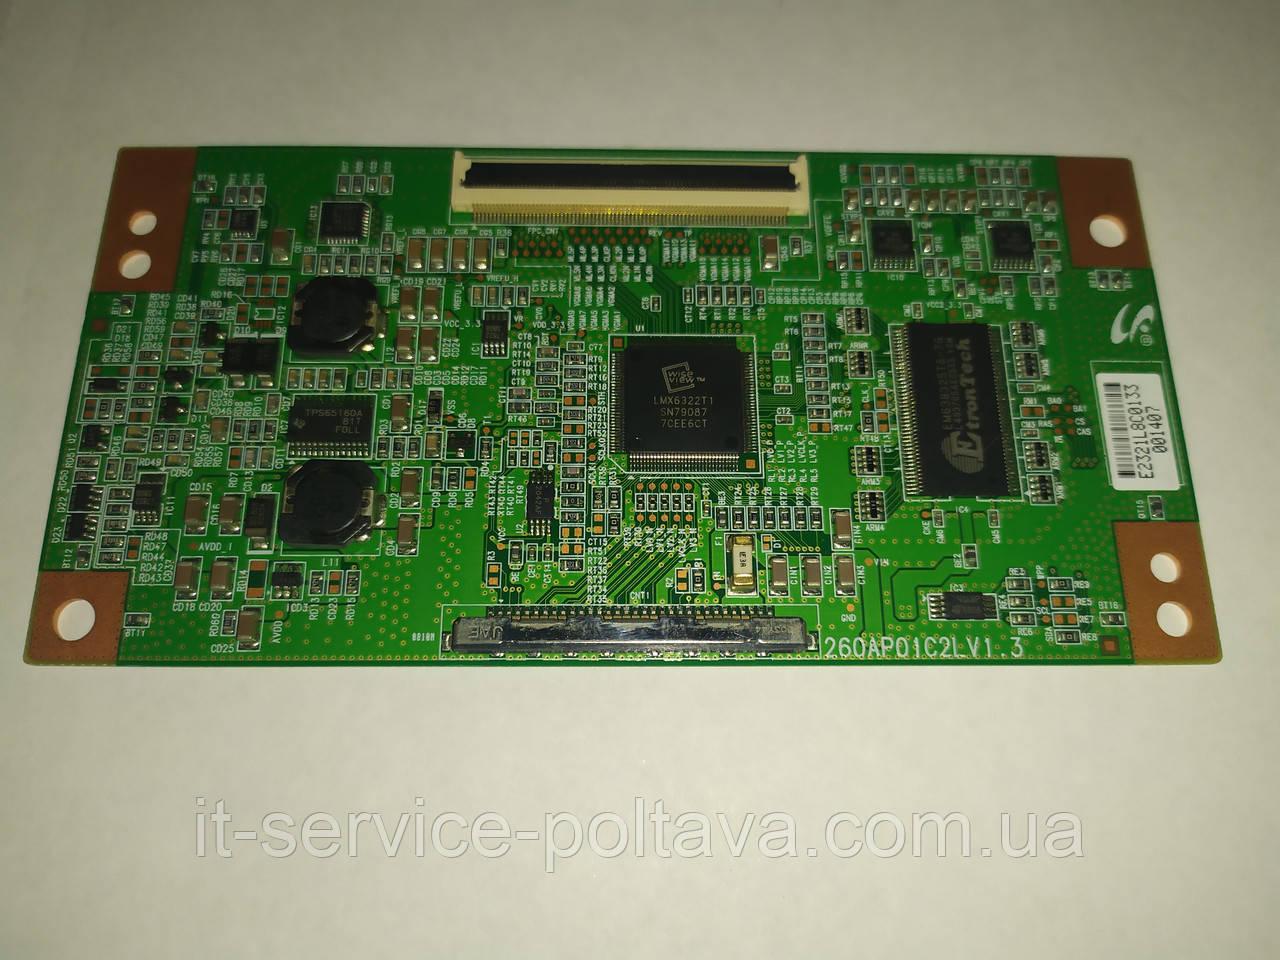 Плата (T-CON) 26OAP01C2LV1.3 для телевізора SAMSUNG